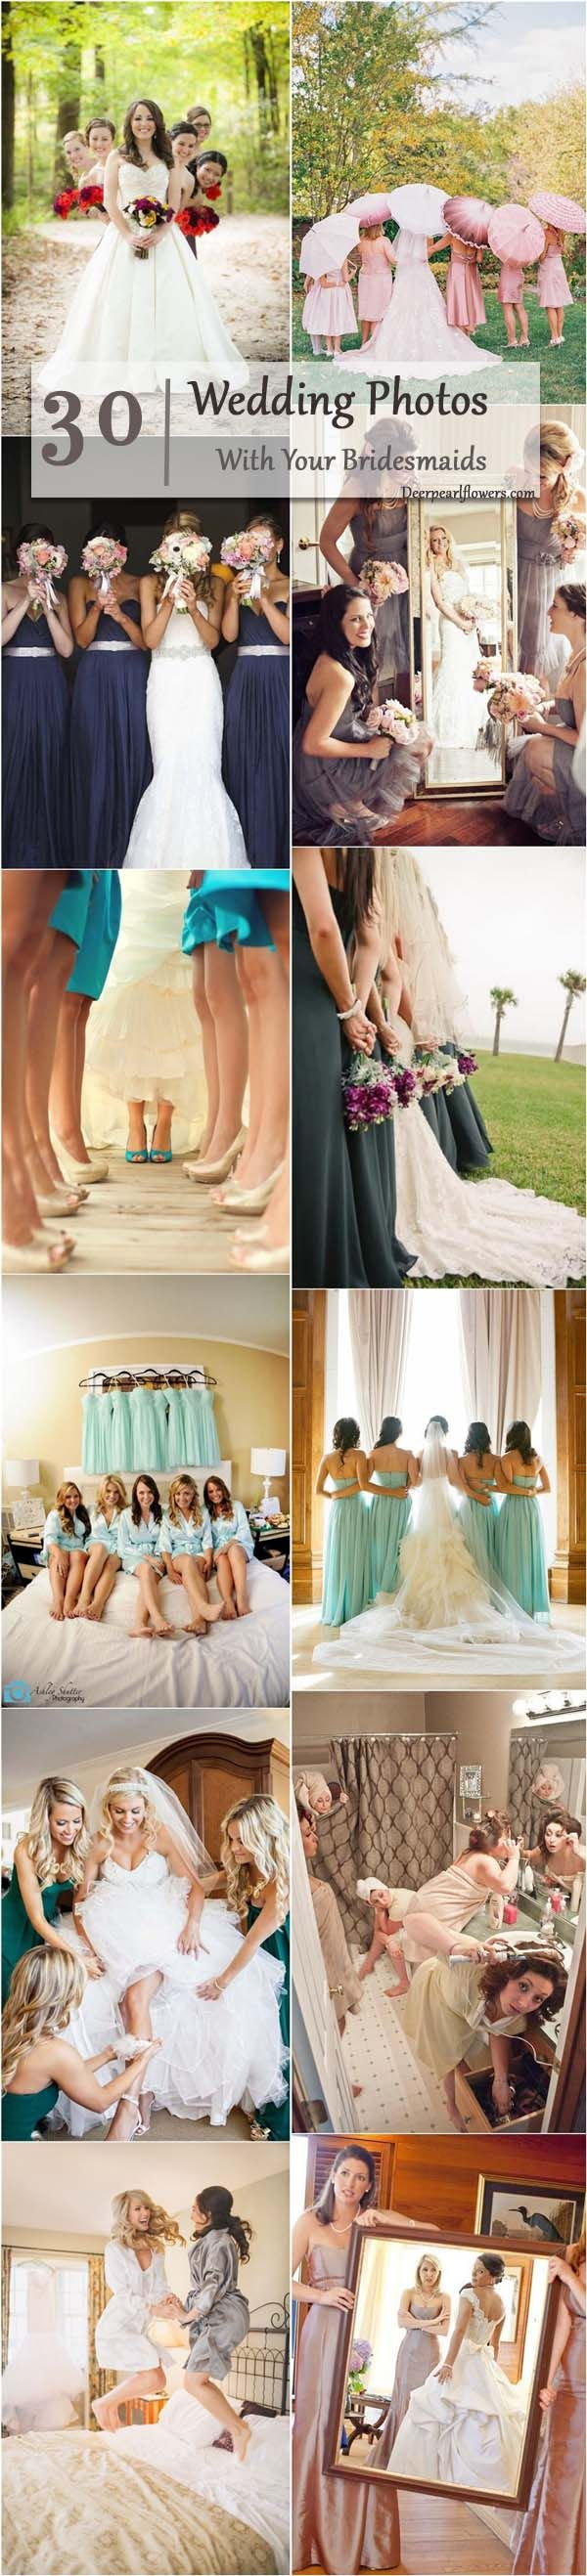 Wedding Photos With Your Bridesmaids